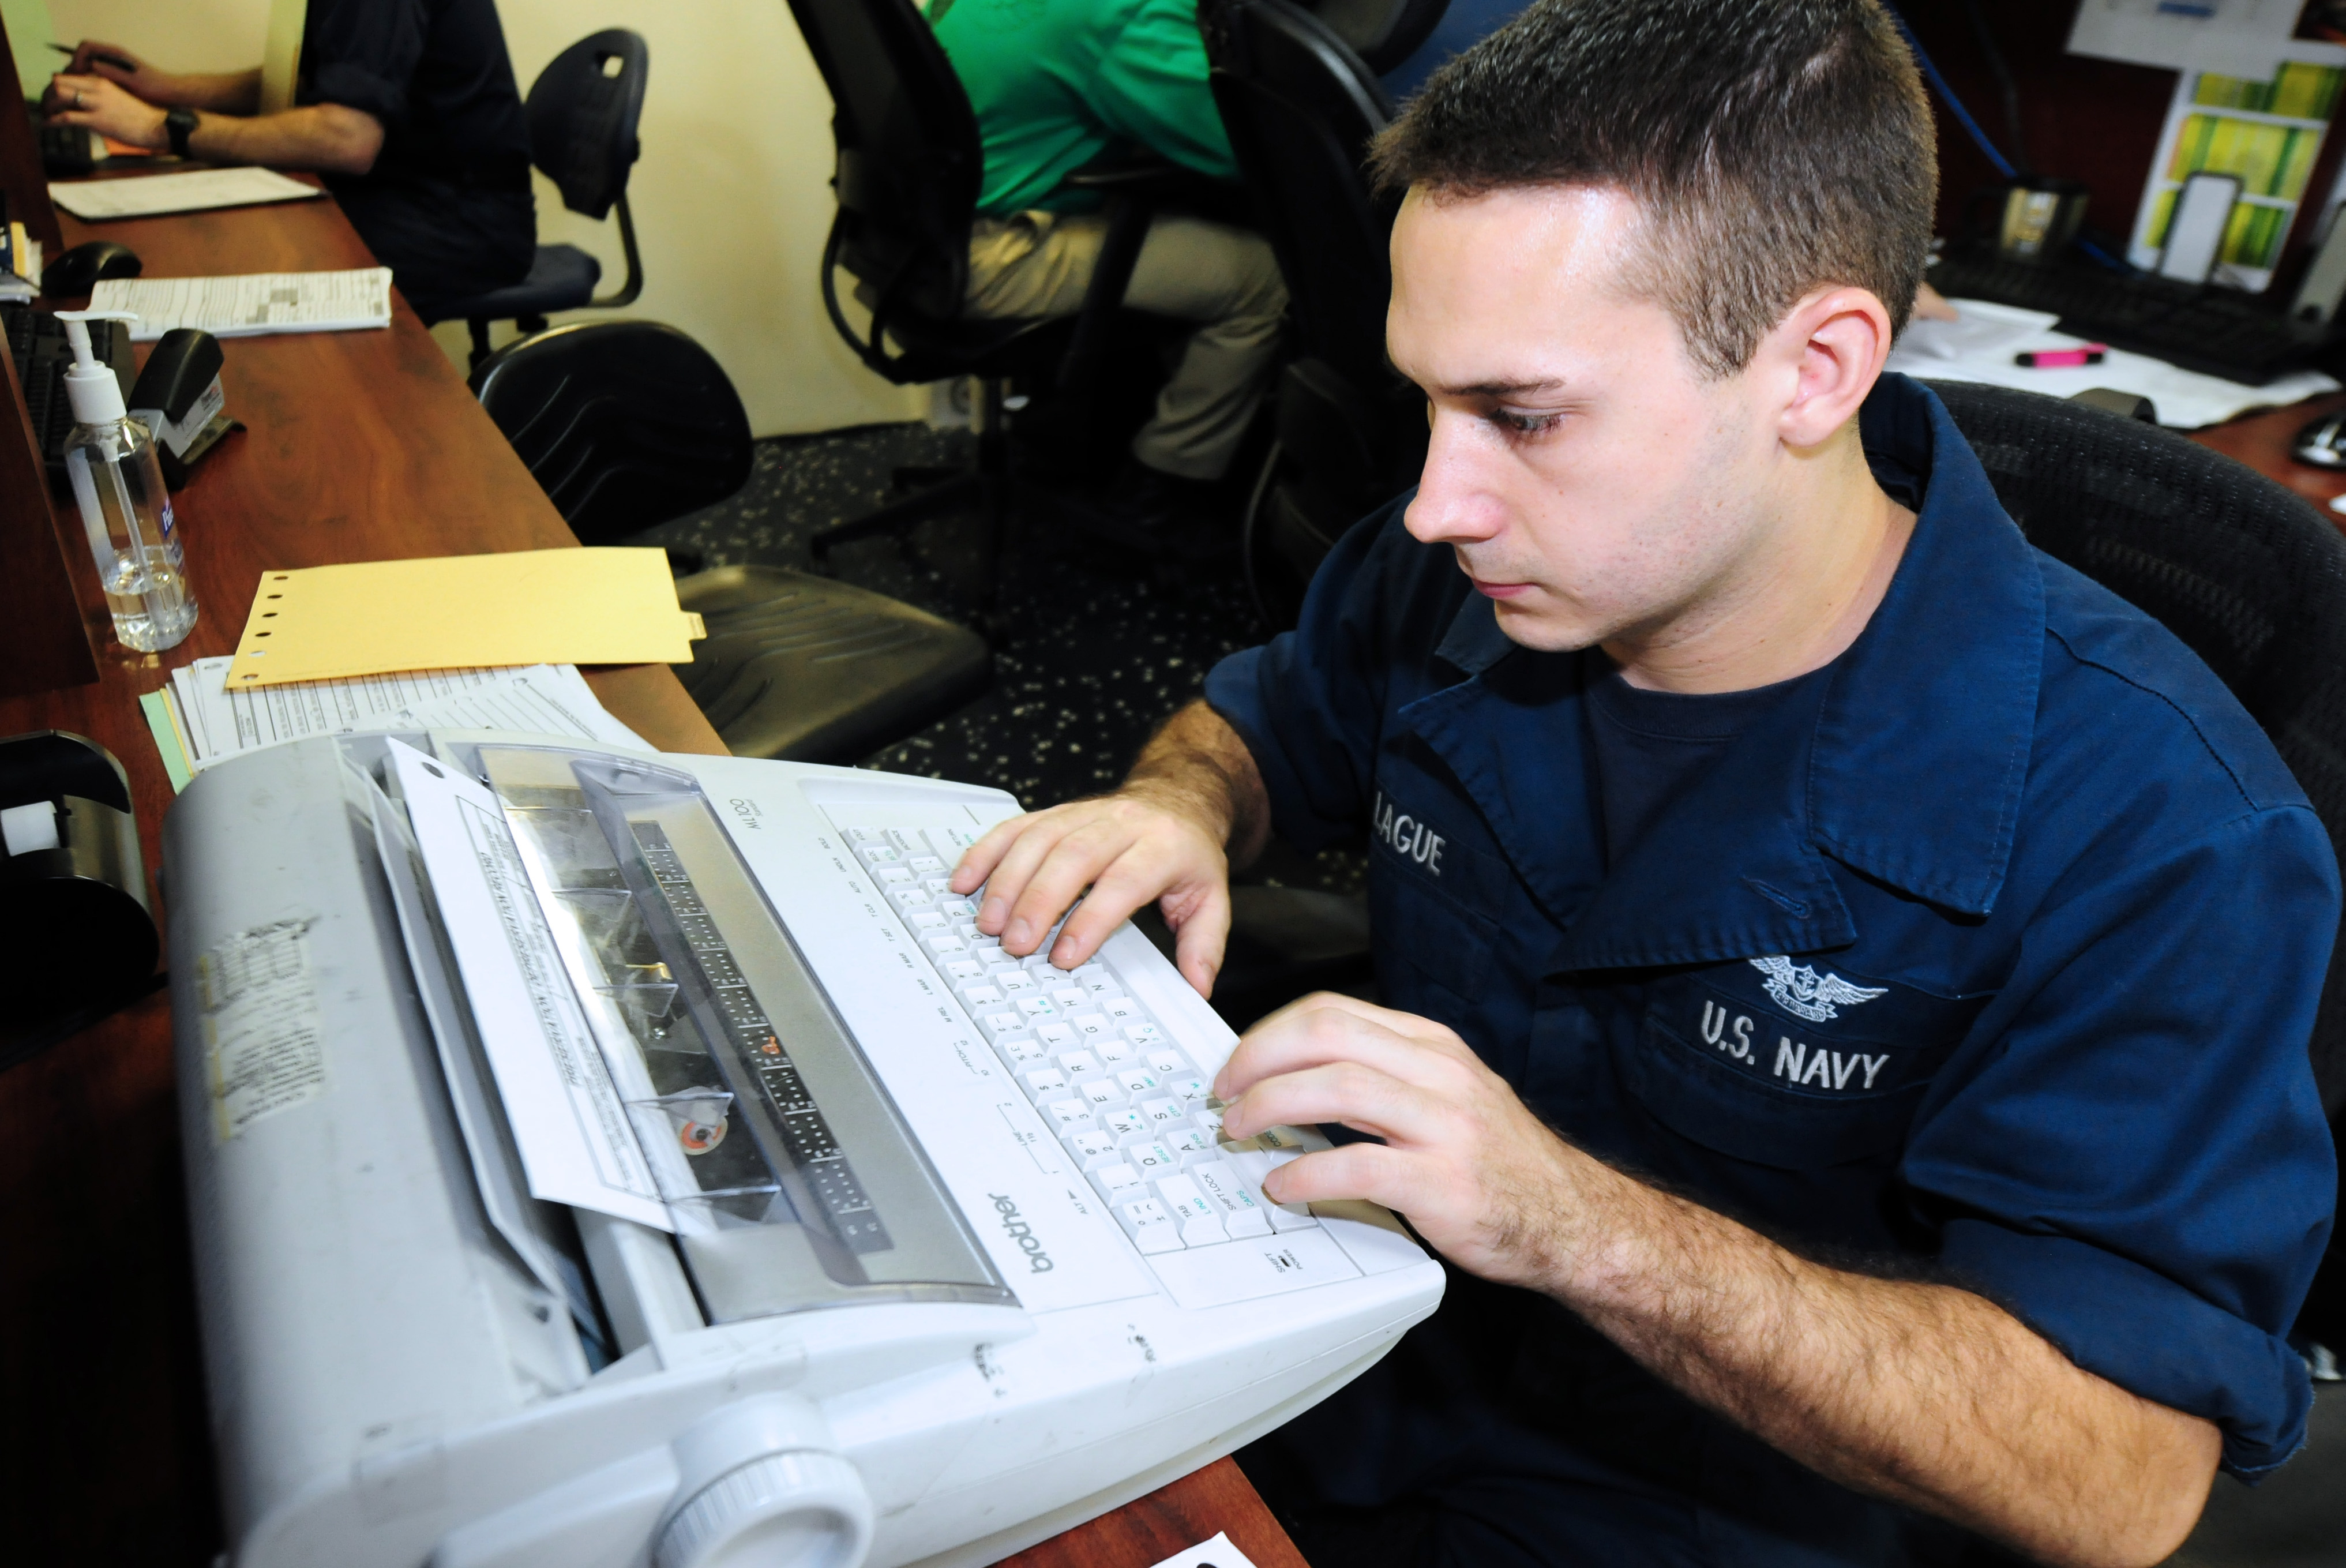 file us navy n ql aviation maintenance file us navy 110920 n ql471 020 aviation maintenance administrationman airman logan